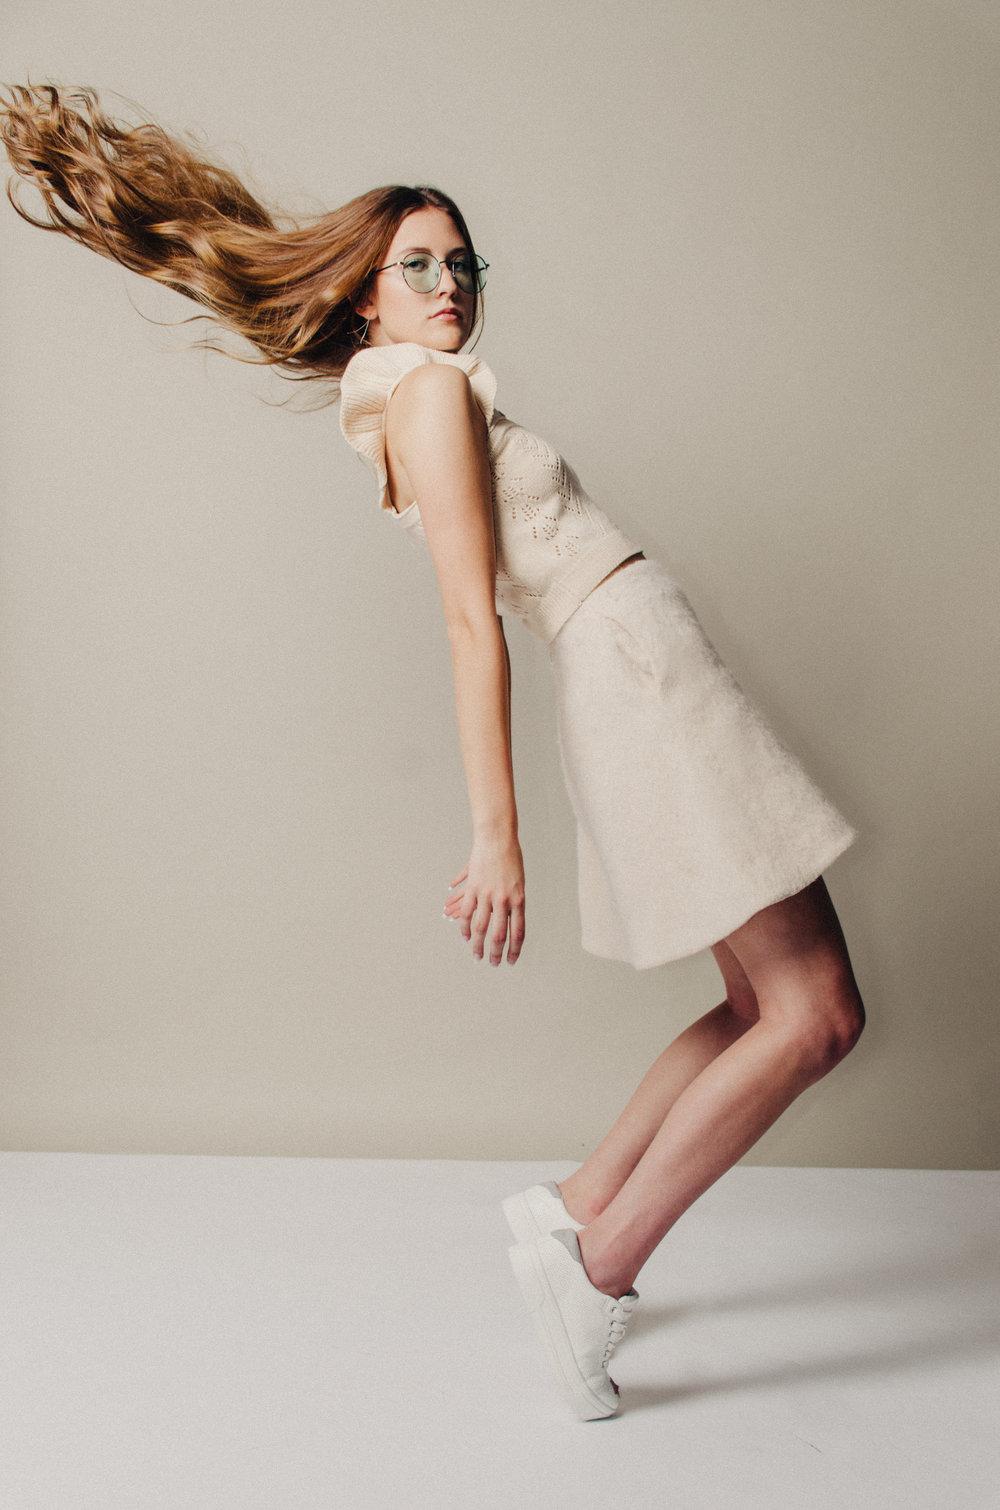 LADYGUNN __Raphaelle by Liana Carbone-5.jpg